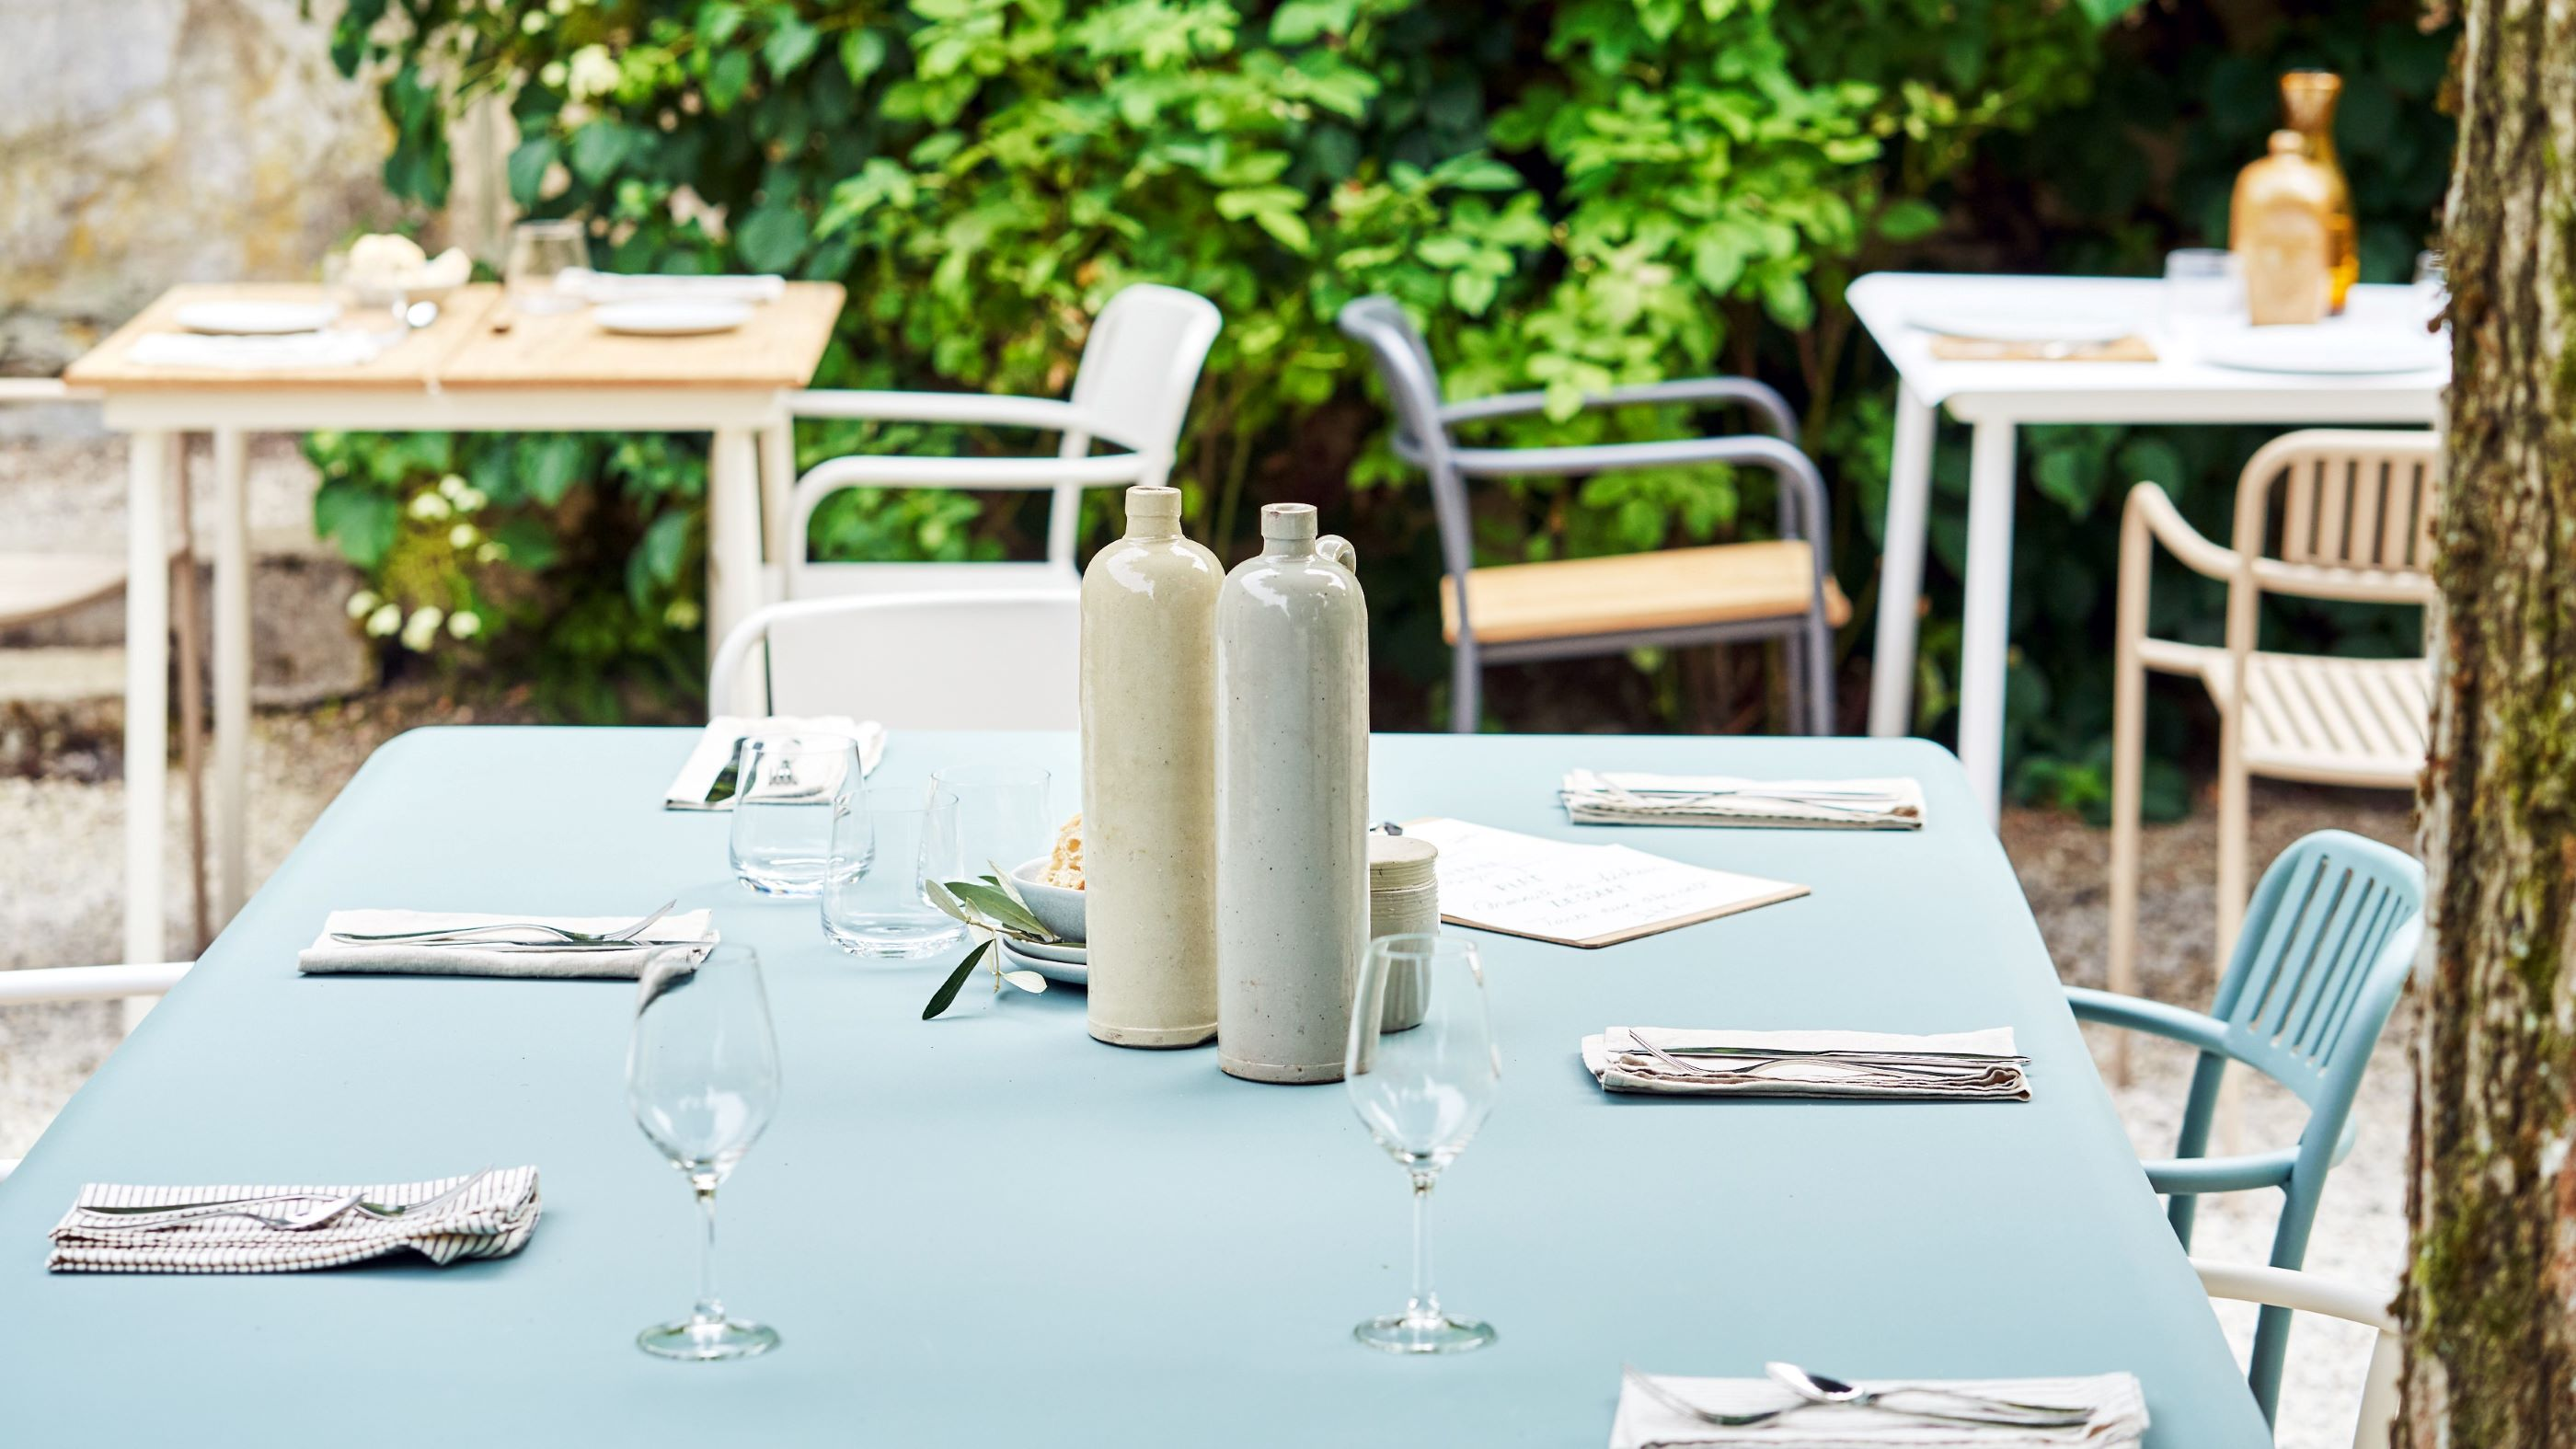 tolix-patio-outdoor-table-lifestlye.jpg